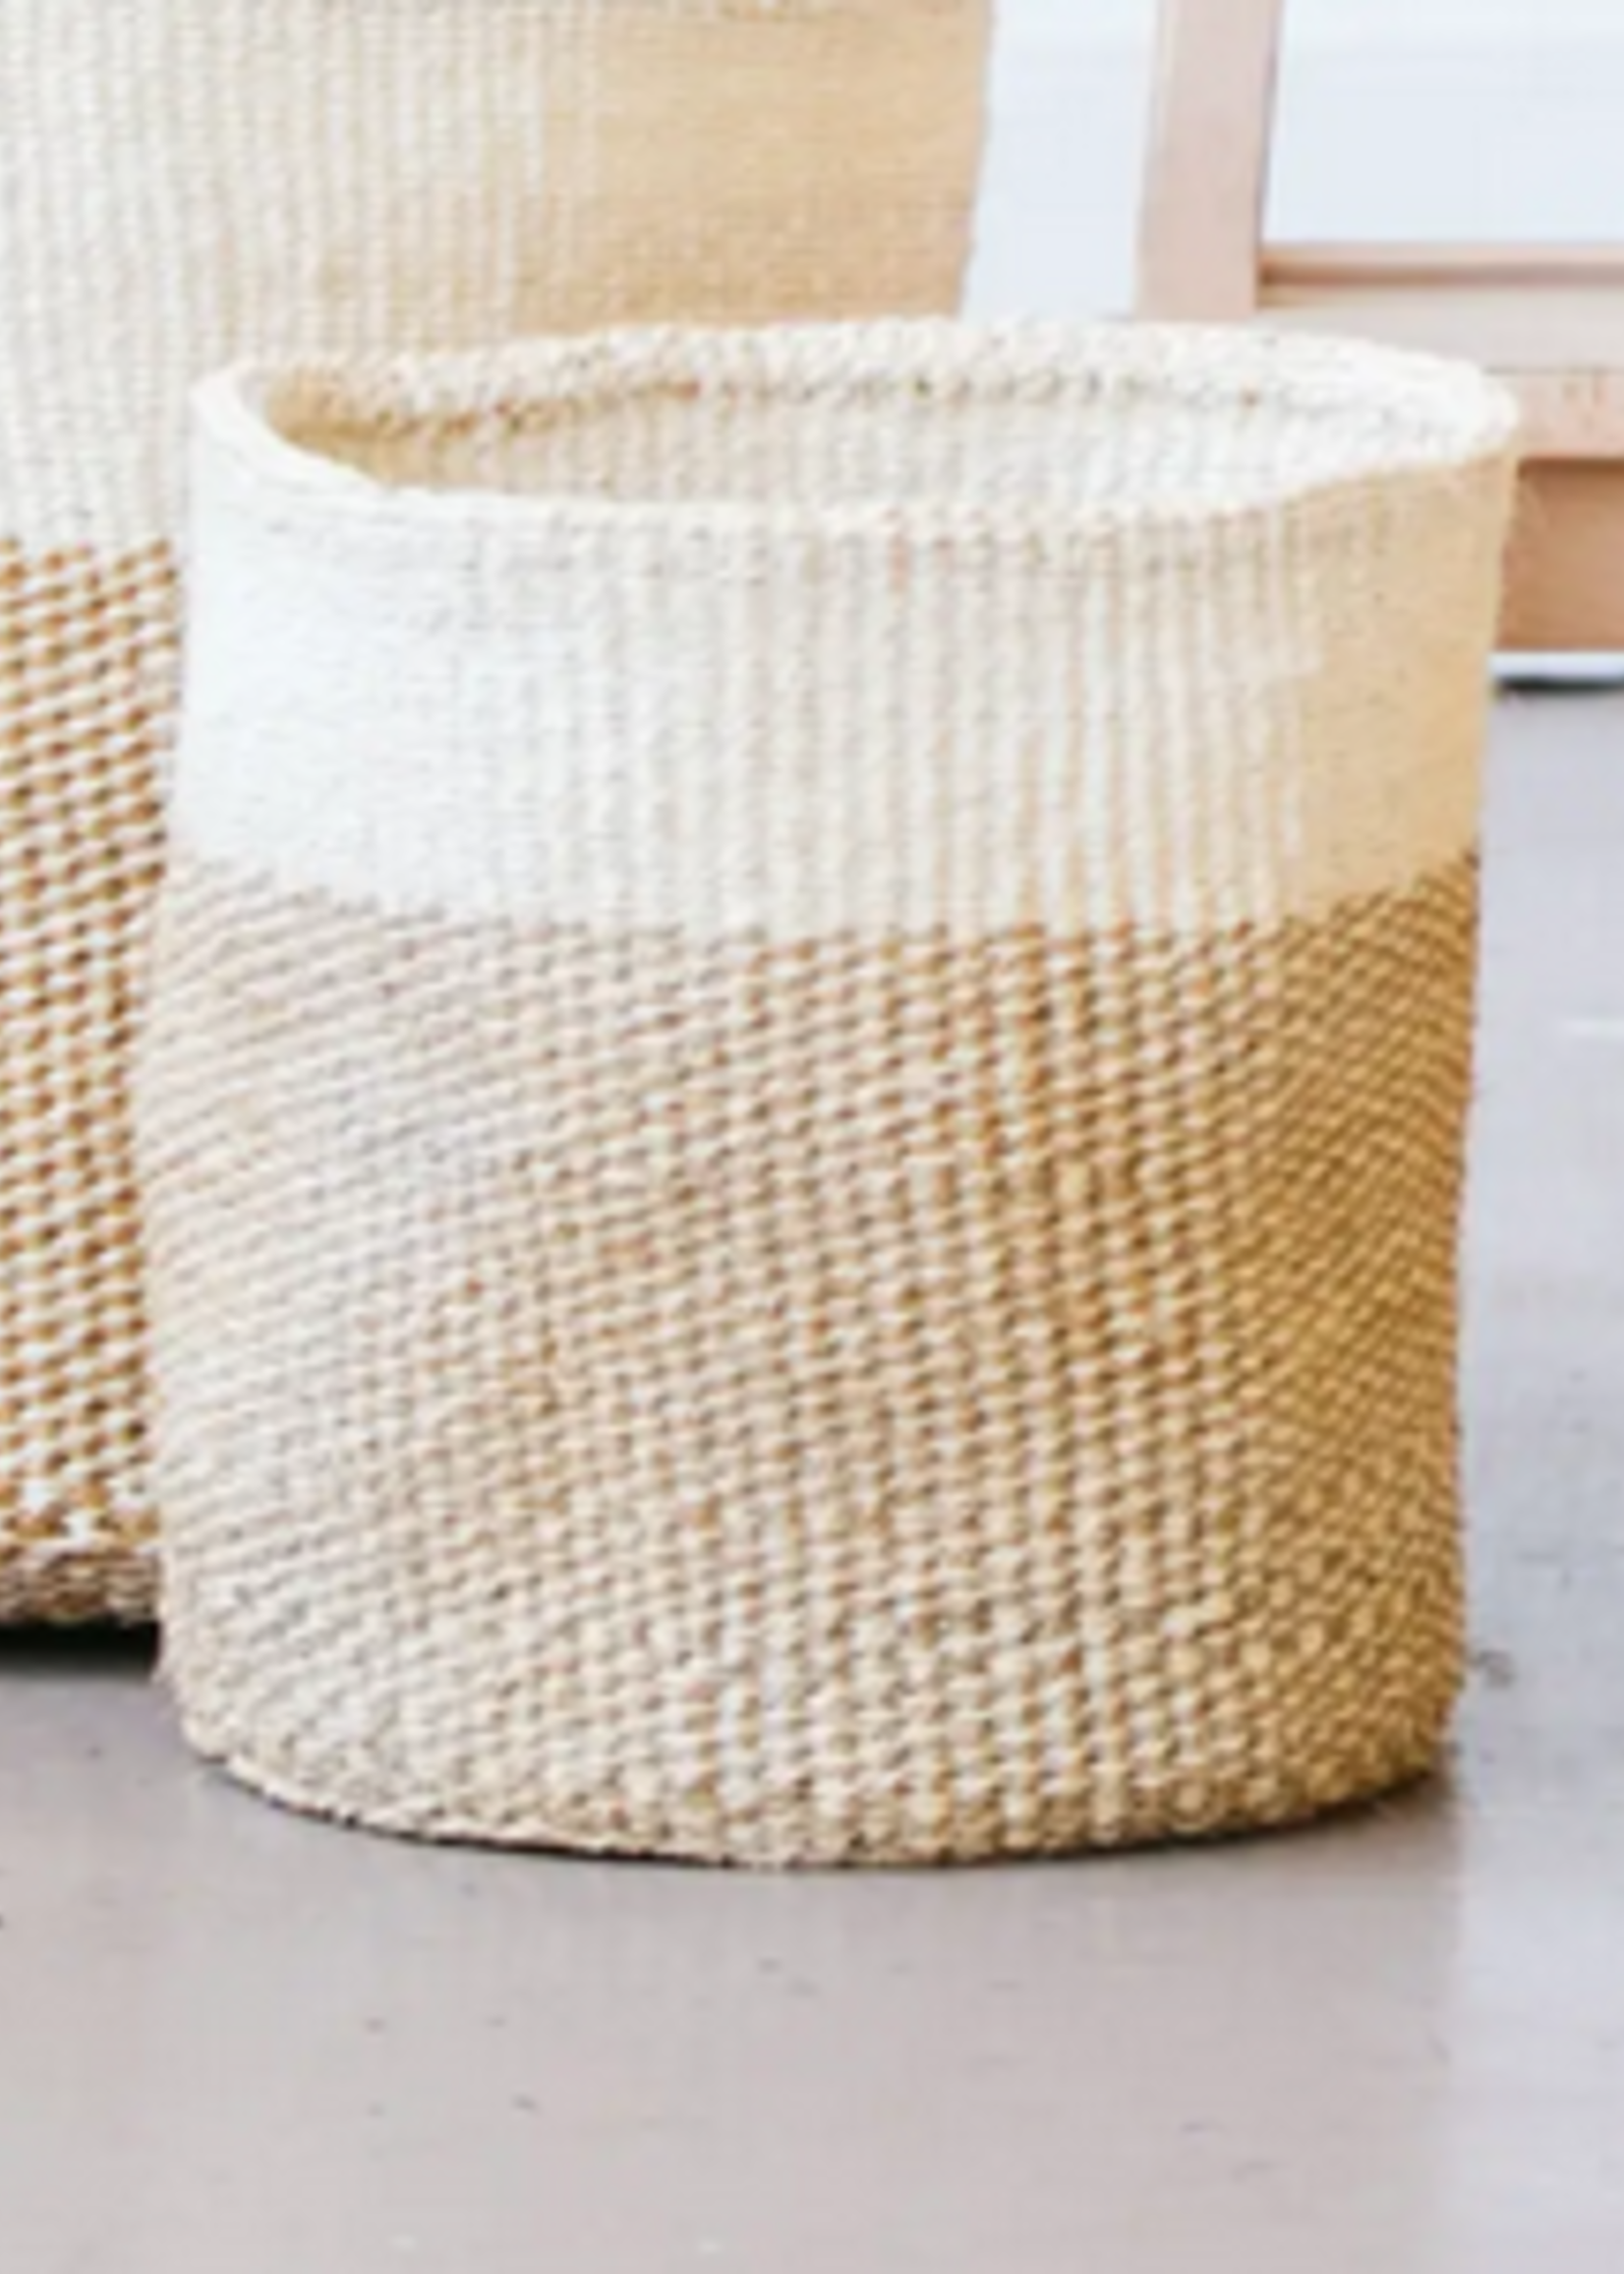 Elitaire Petite Natural Medium Storage Basket